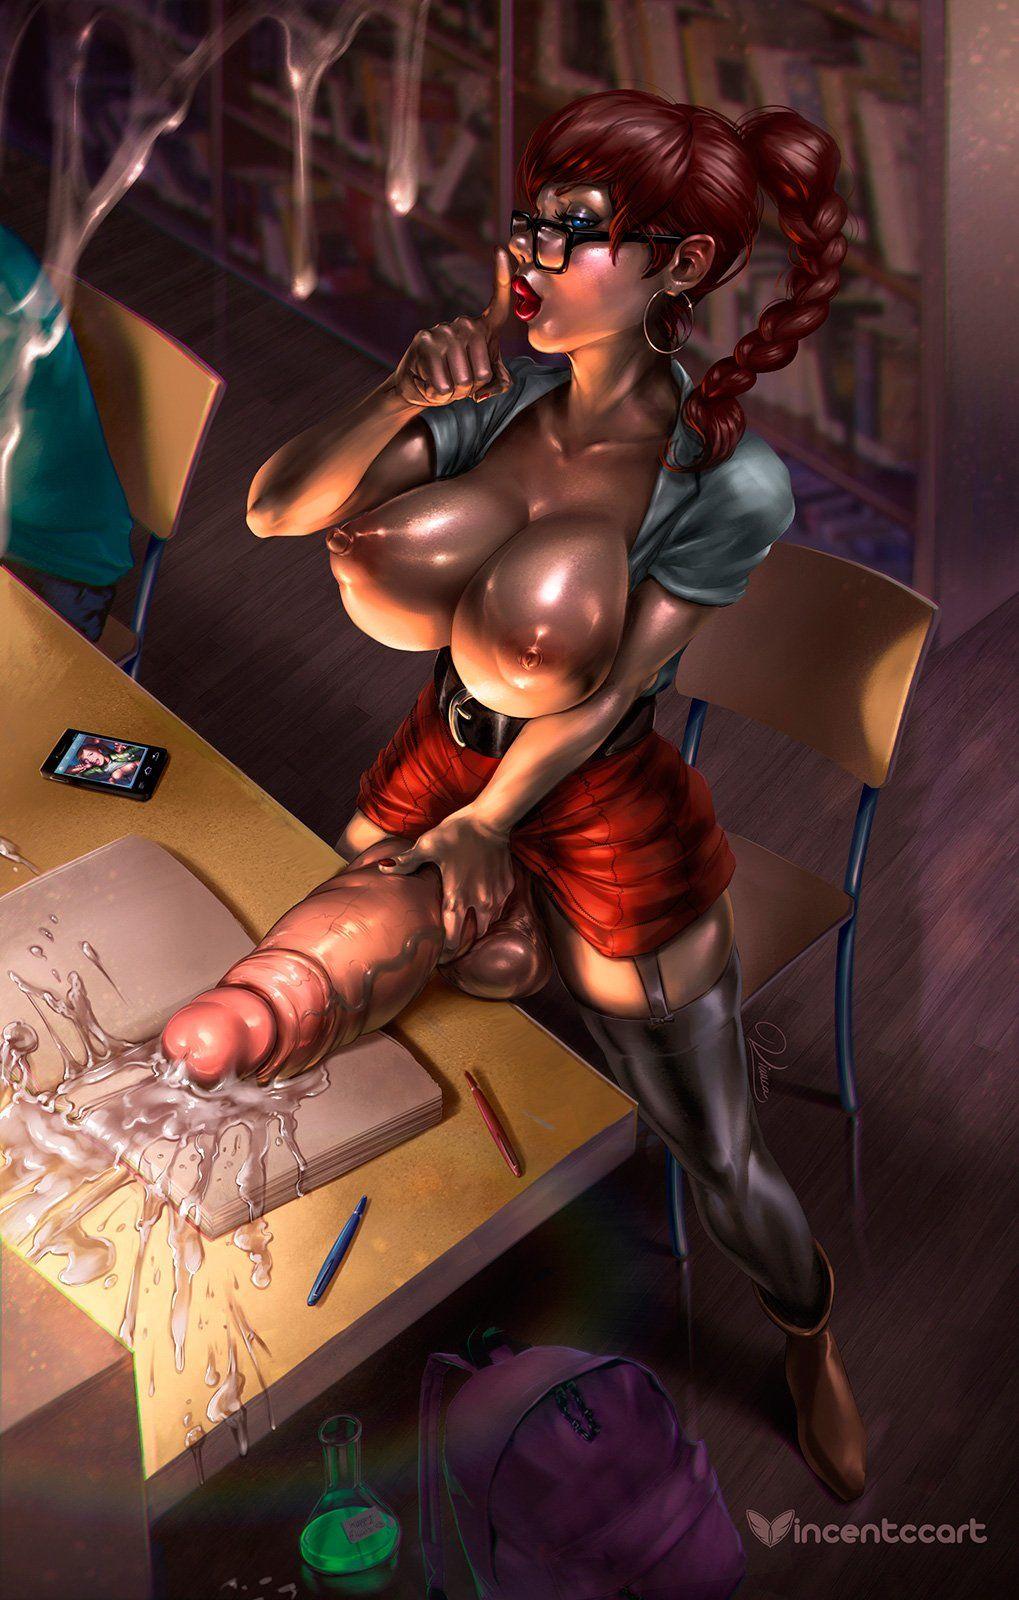 Wicked reccomend Dickgirl hentai figure